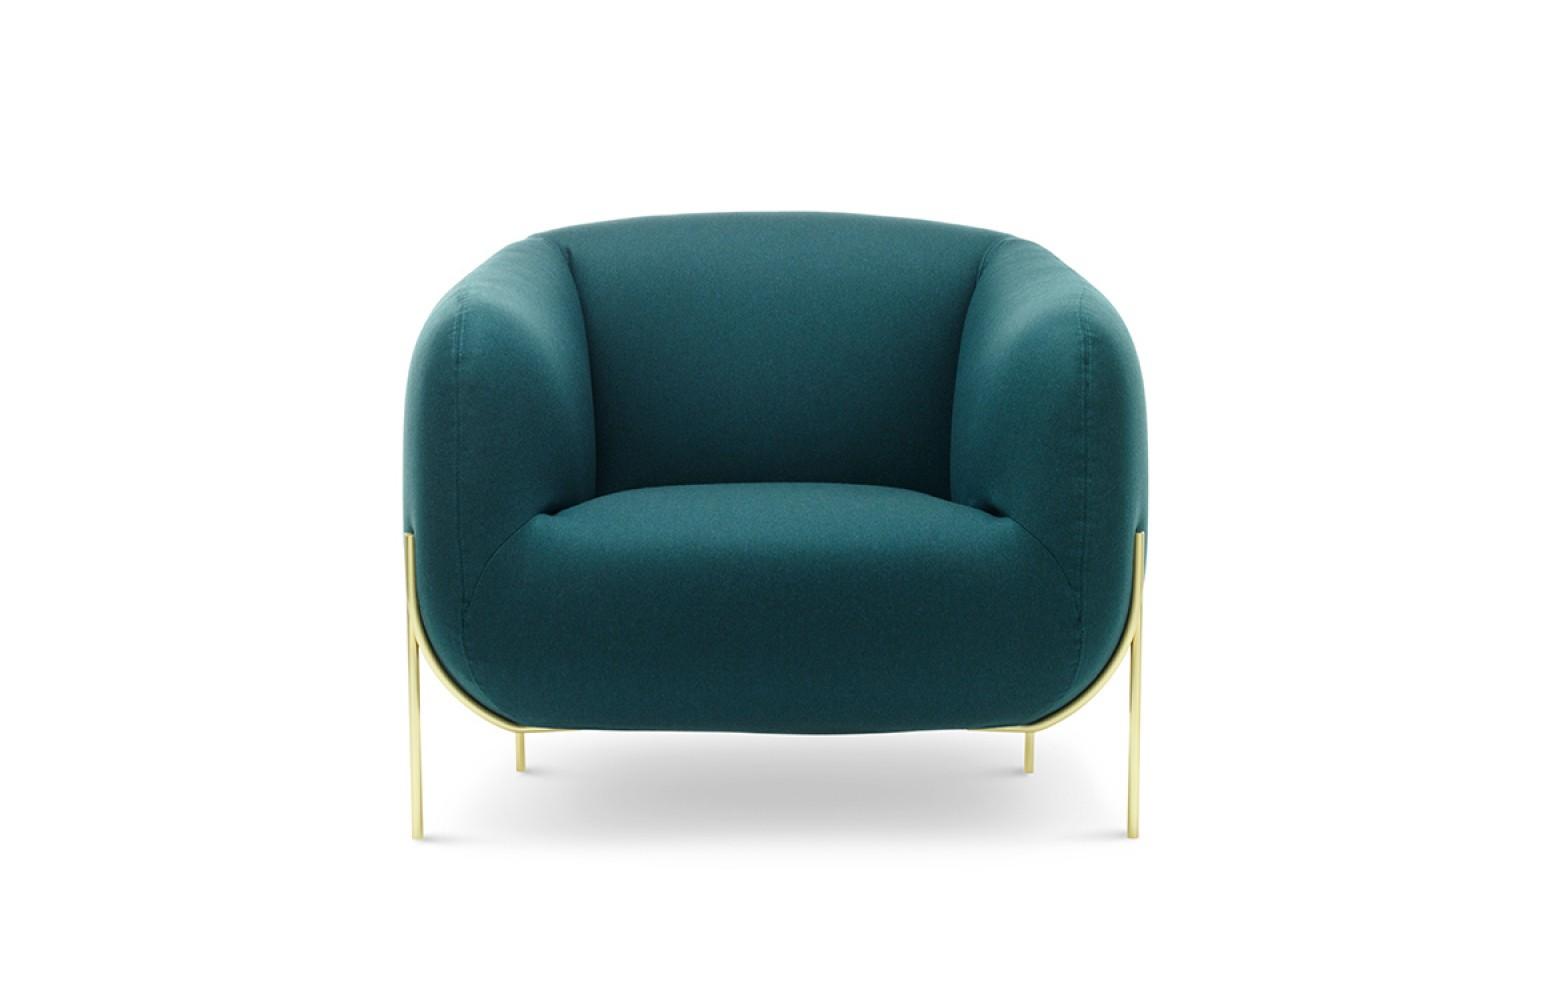 geo sessel sessel liegen polsterm bel who 39 s perfect. Black Bedroom Furniture Sets. Home Design Ideas